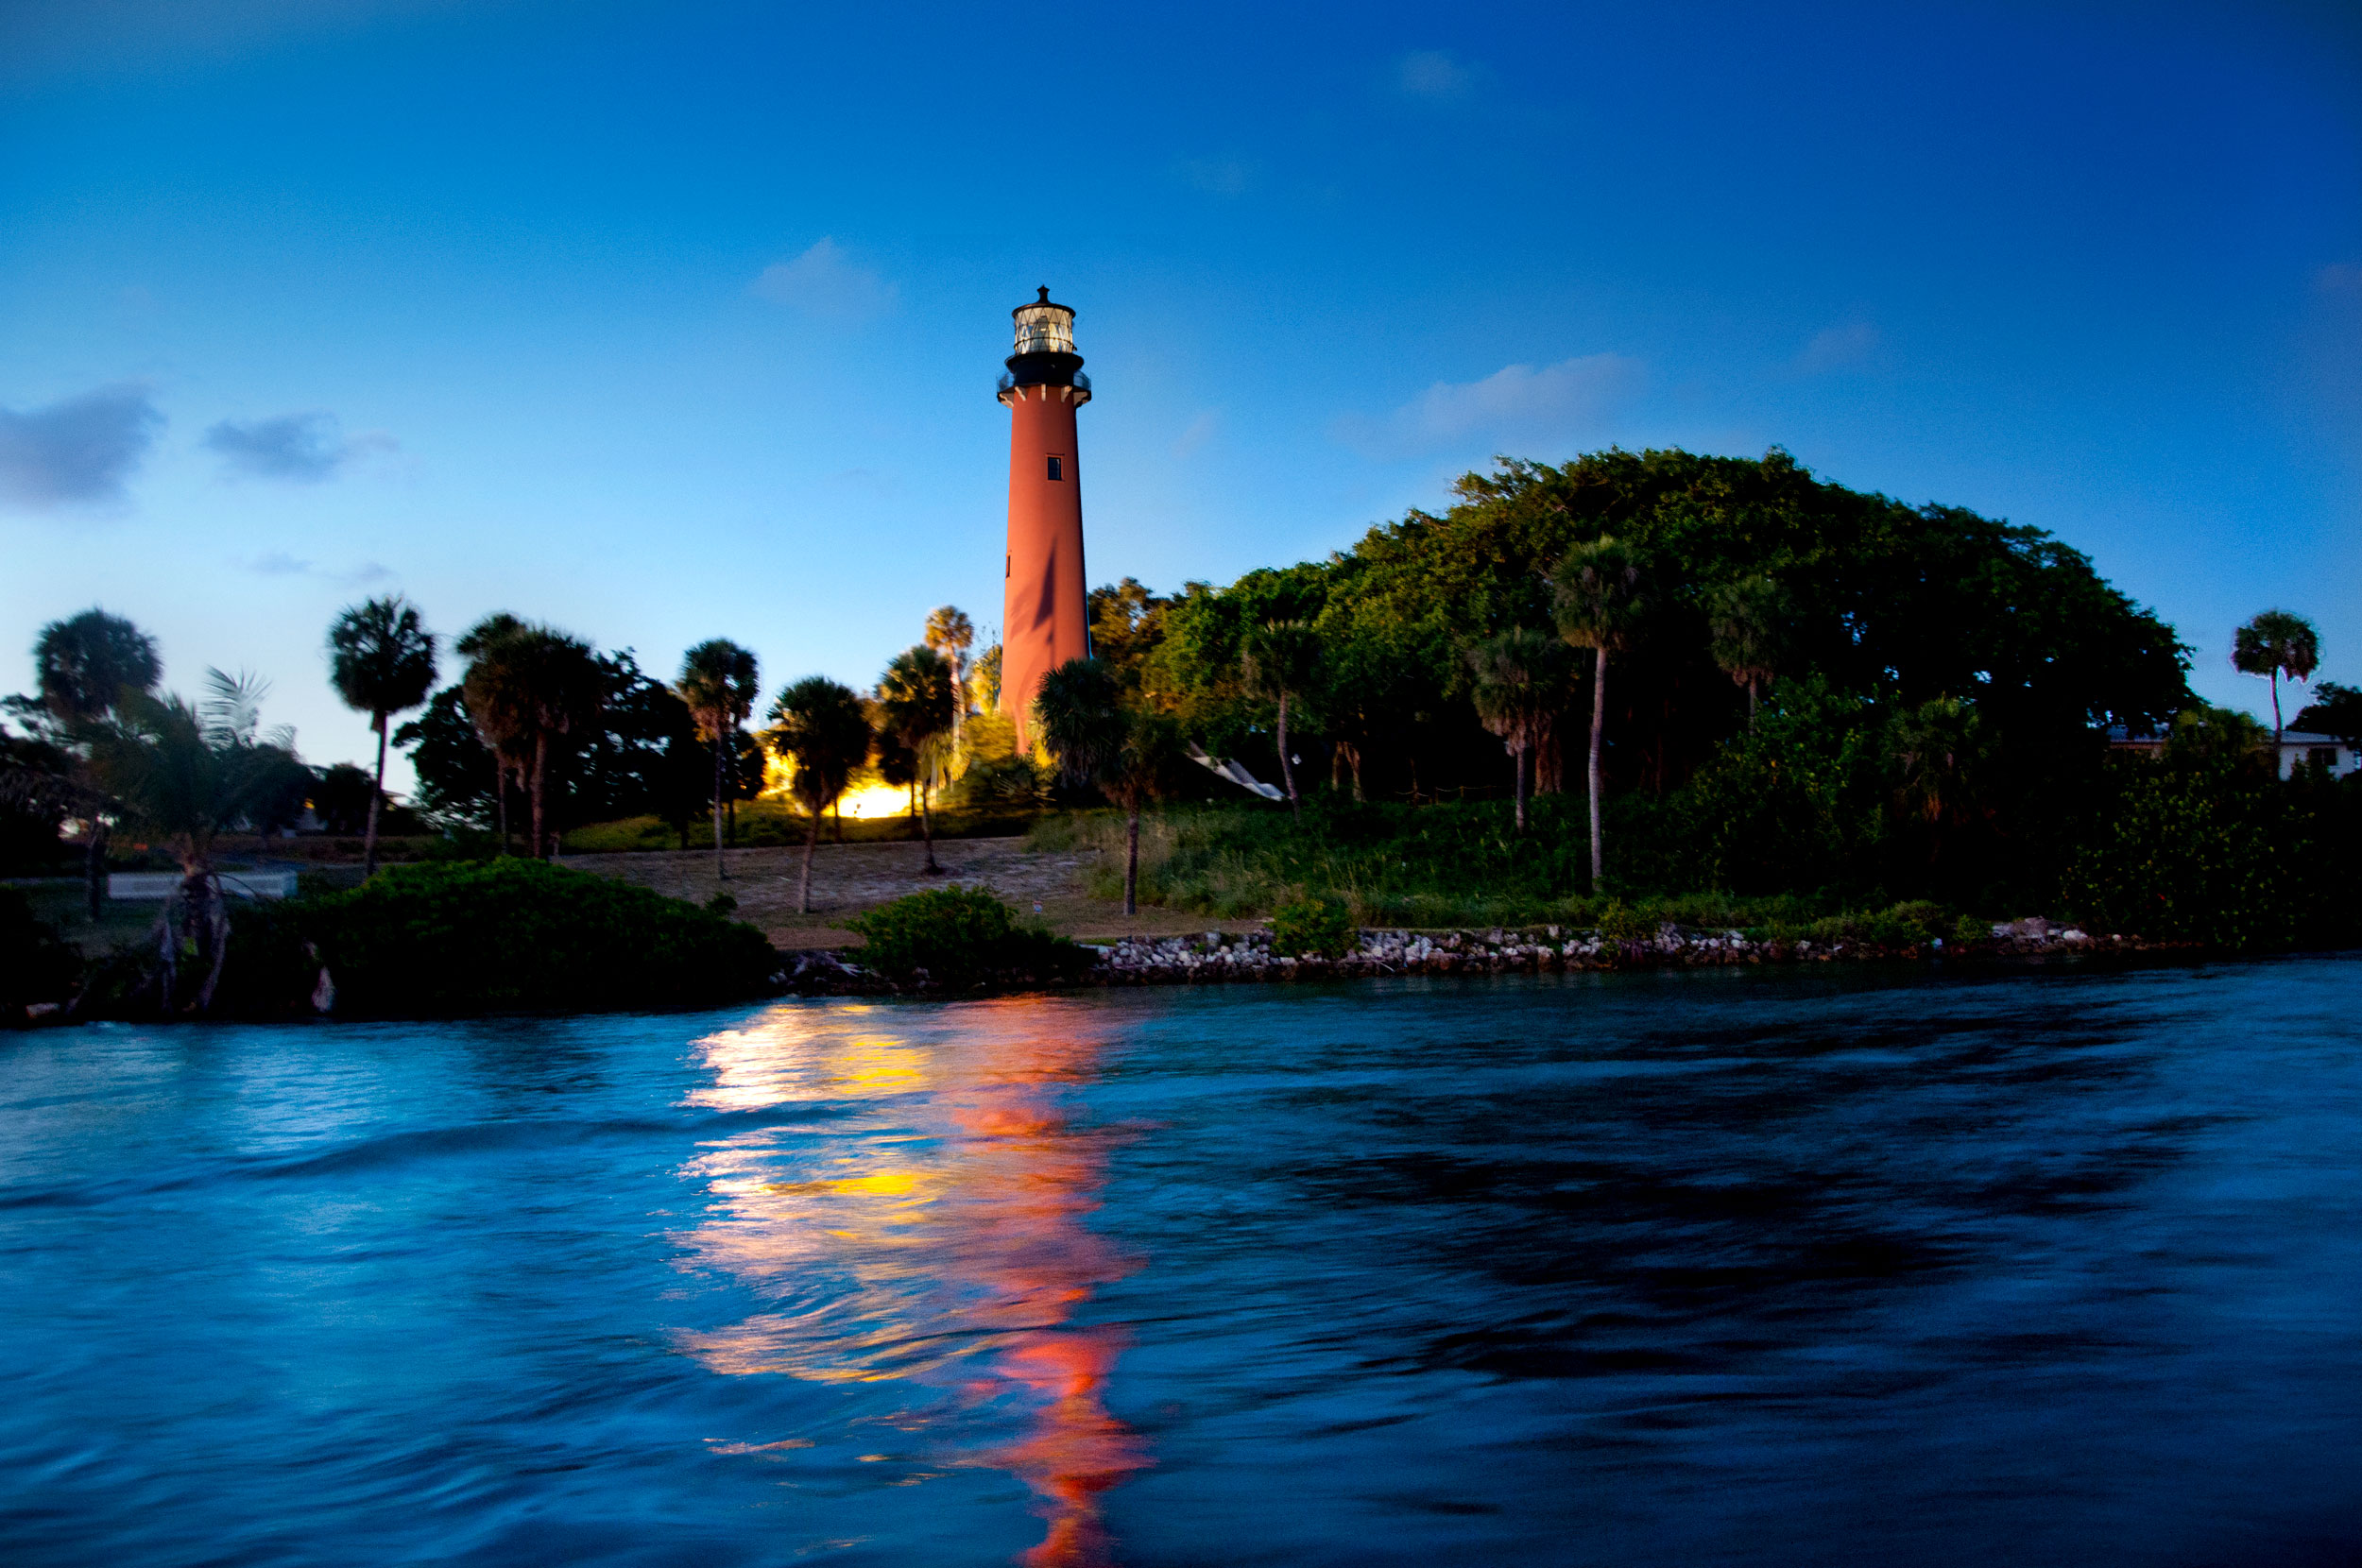 Sunset_lighthouse-1-large.jpg